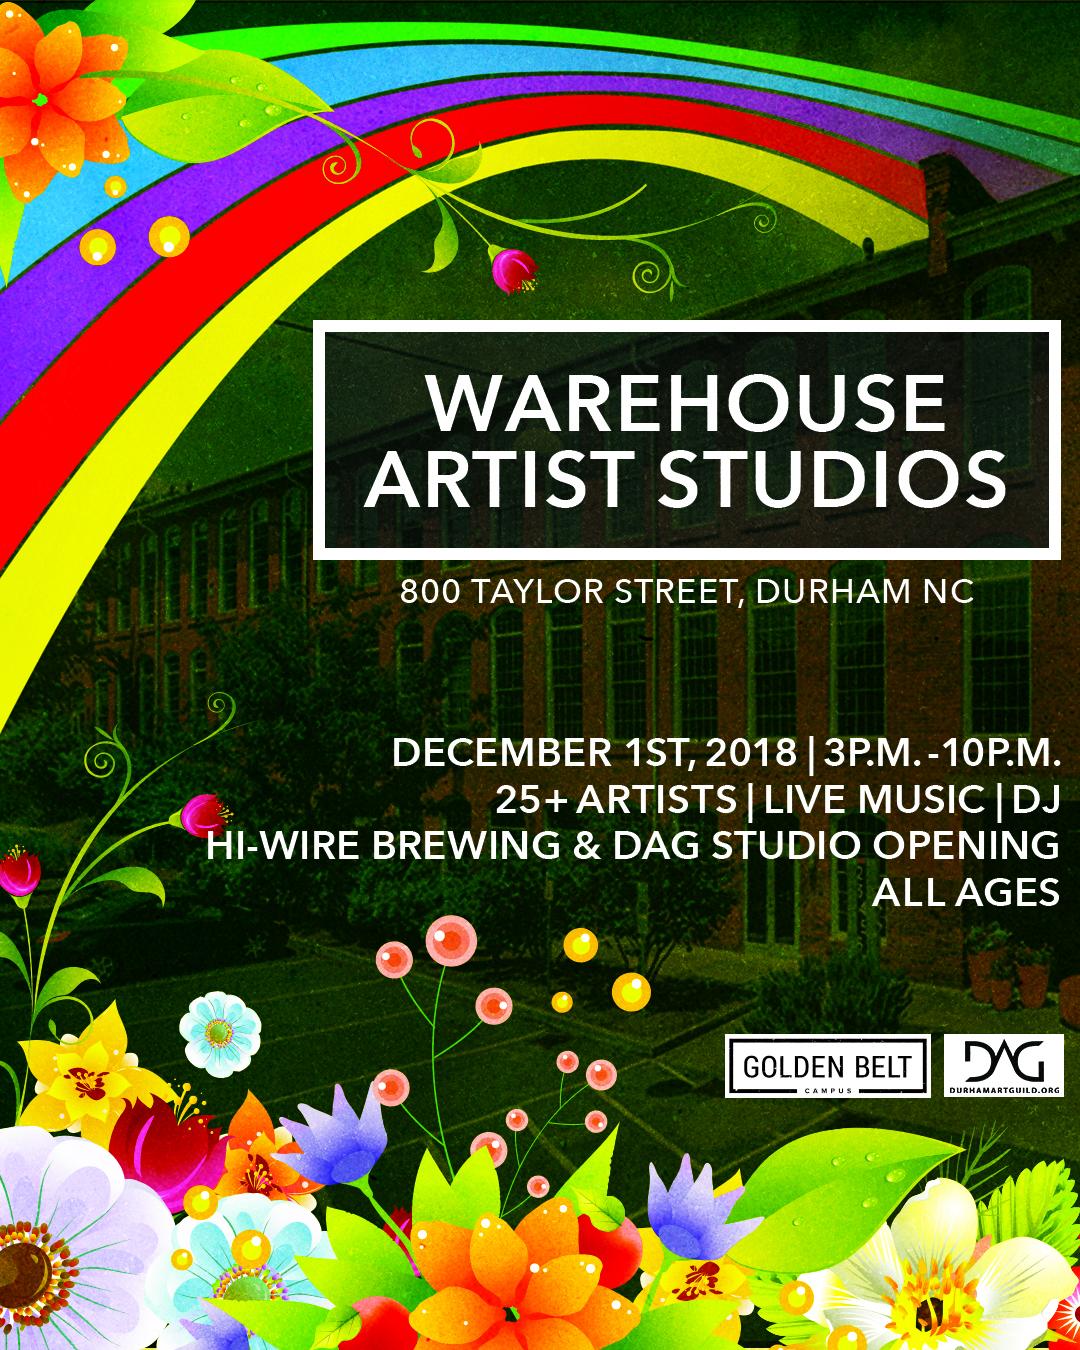 GB Warehouse Artist Studios IG.jpg